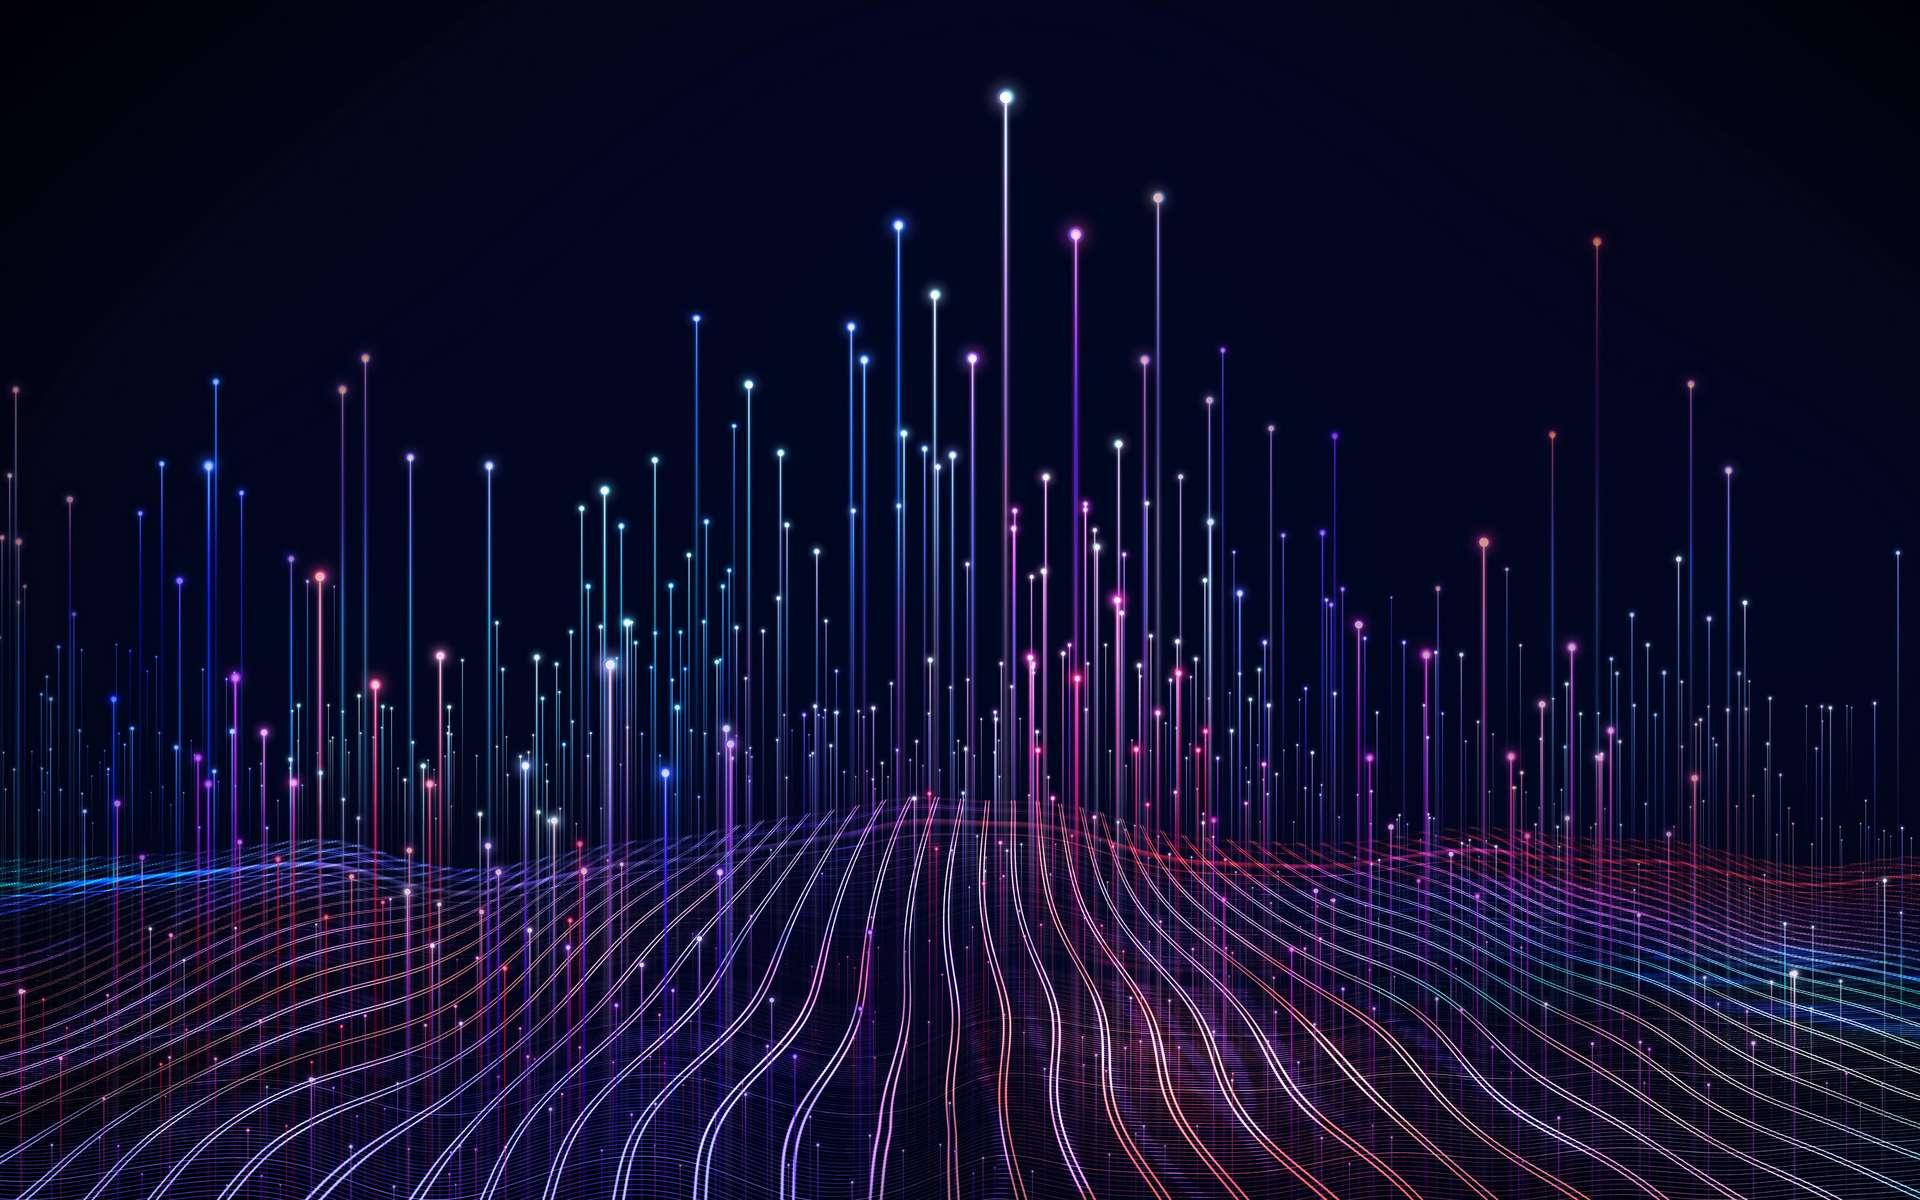 Logiciels qui permet d'extraire un son d'une vidéo © jamesteohart, Adobe Stock